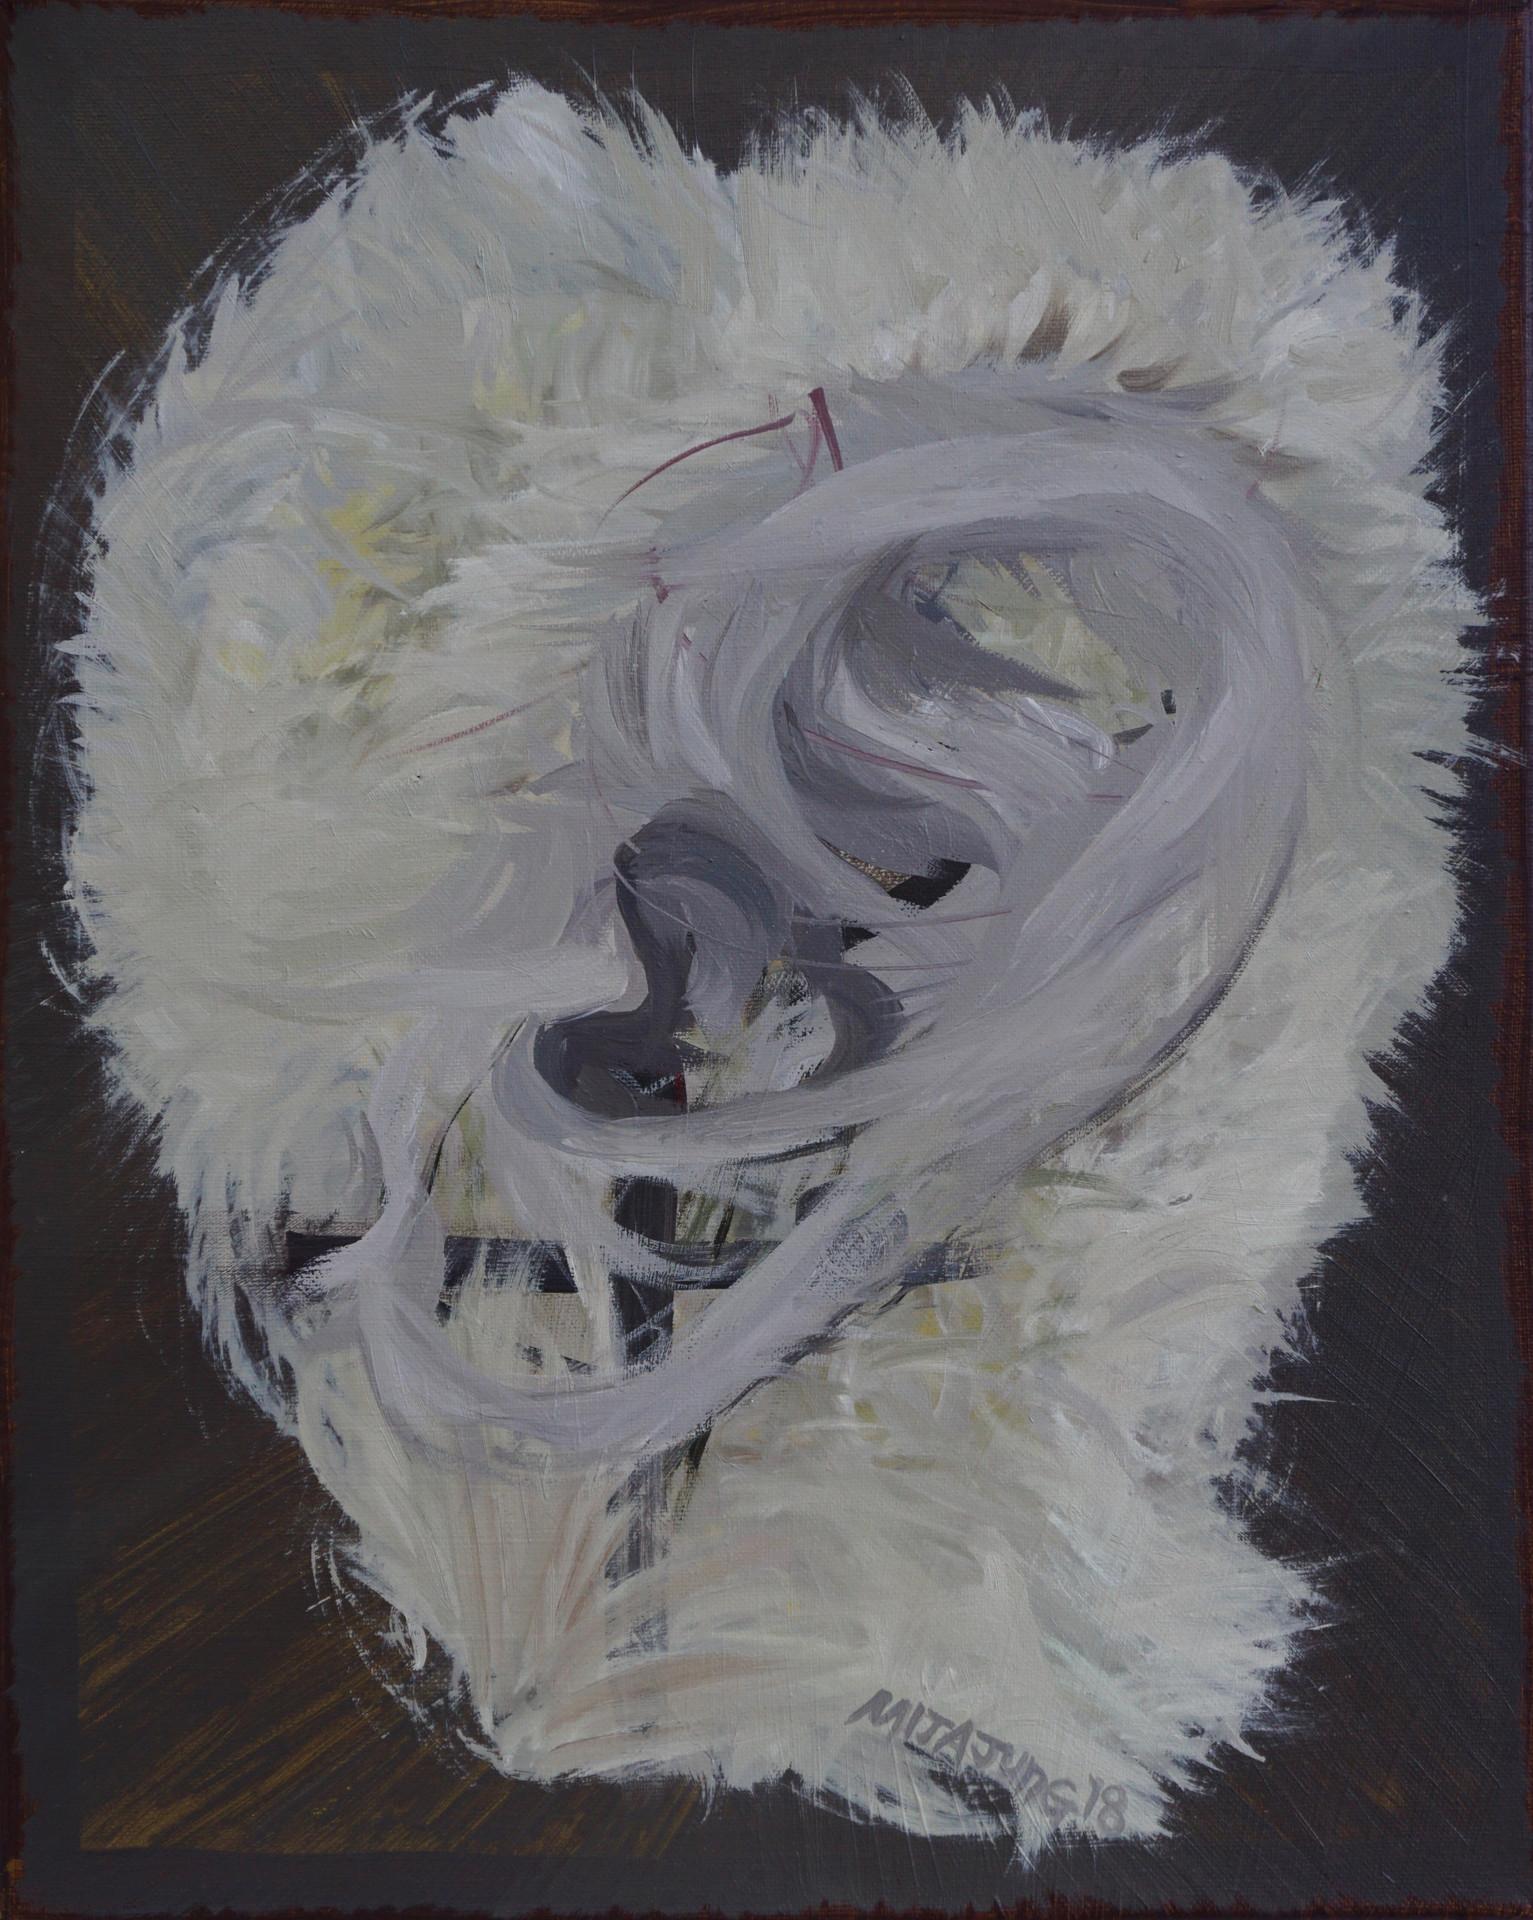 Soft Cactus Listener, 16x20inches, oil on canvas, 2018DSC01518.jpg